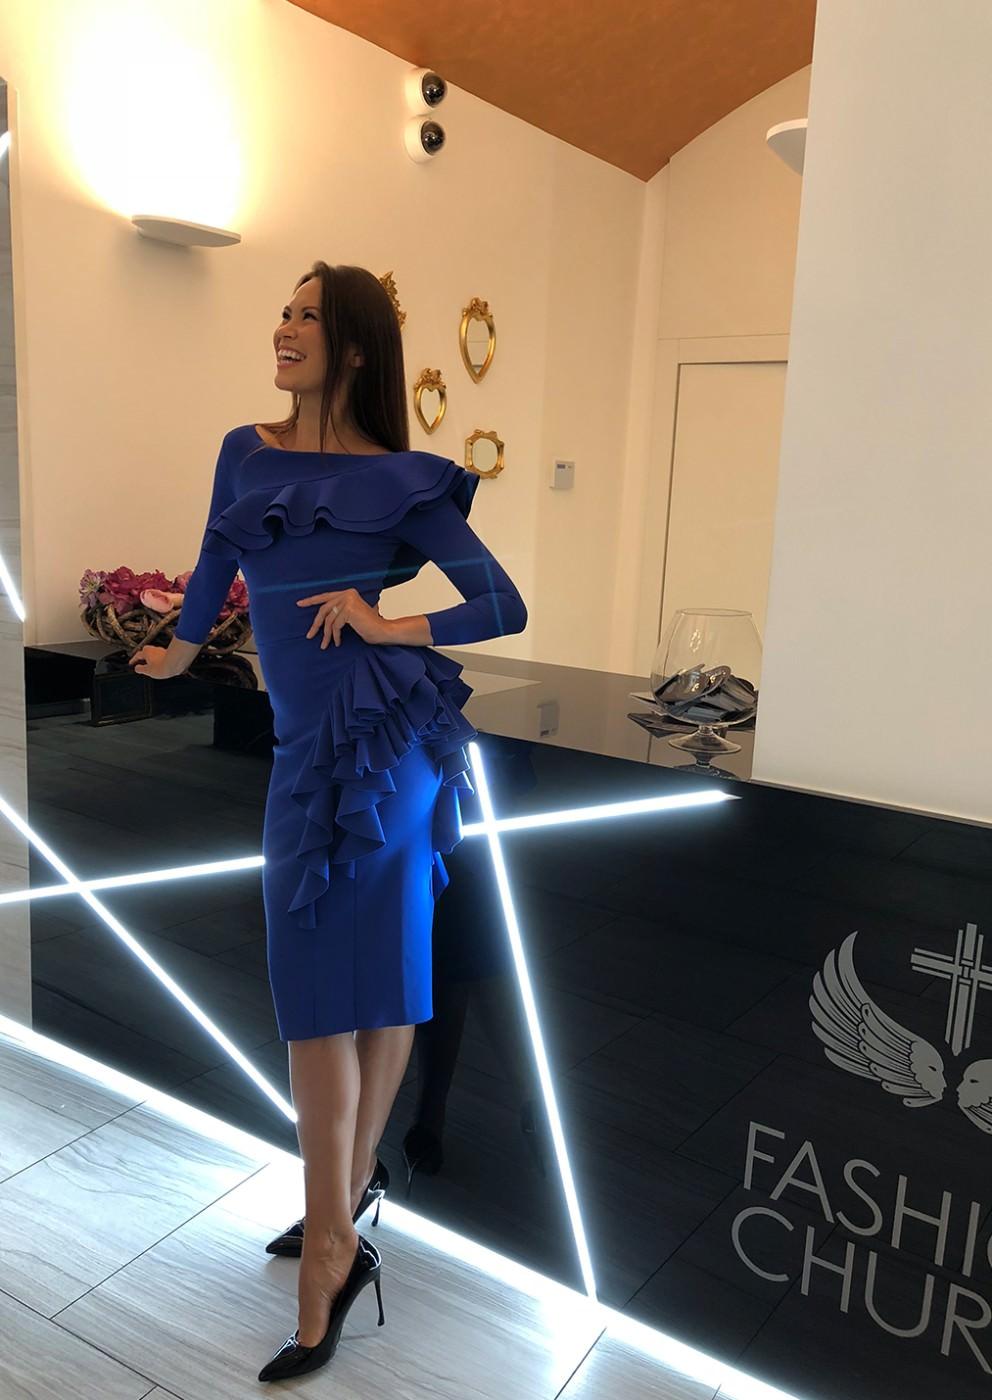 Fashion-Church-kolekce-podzim-13